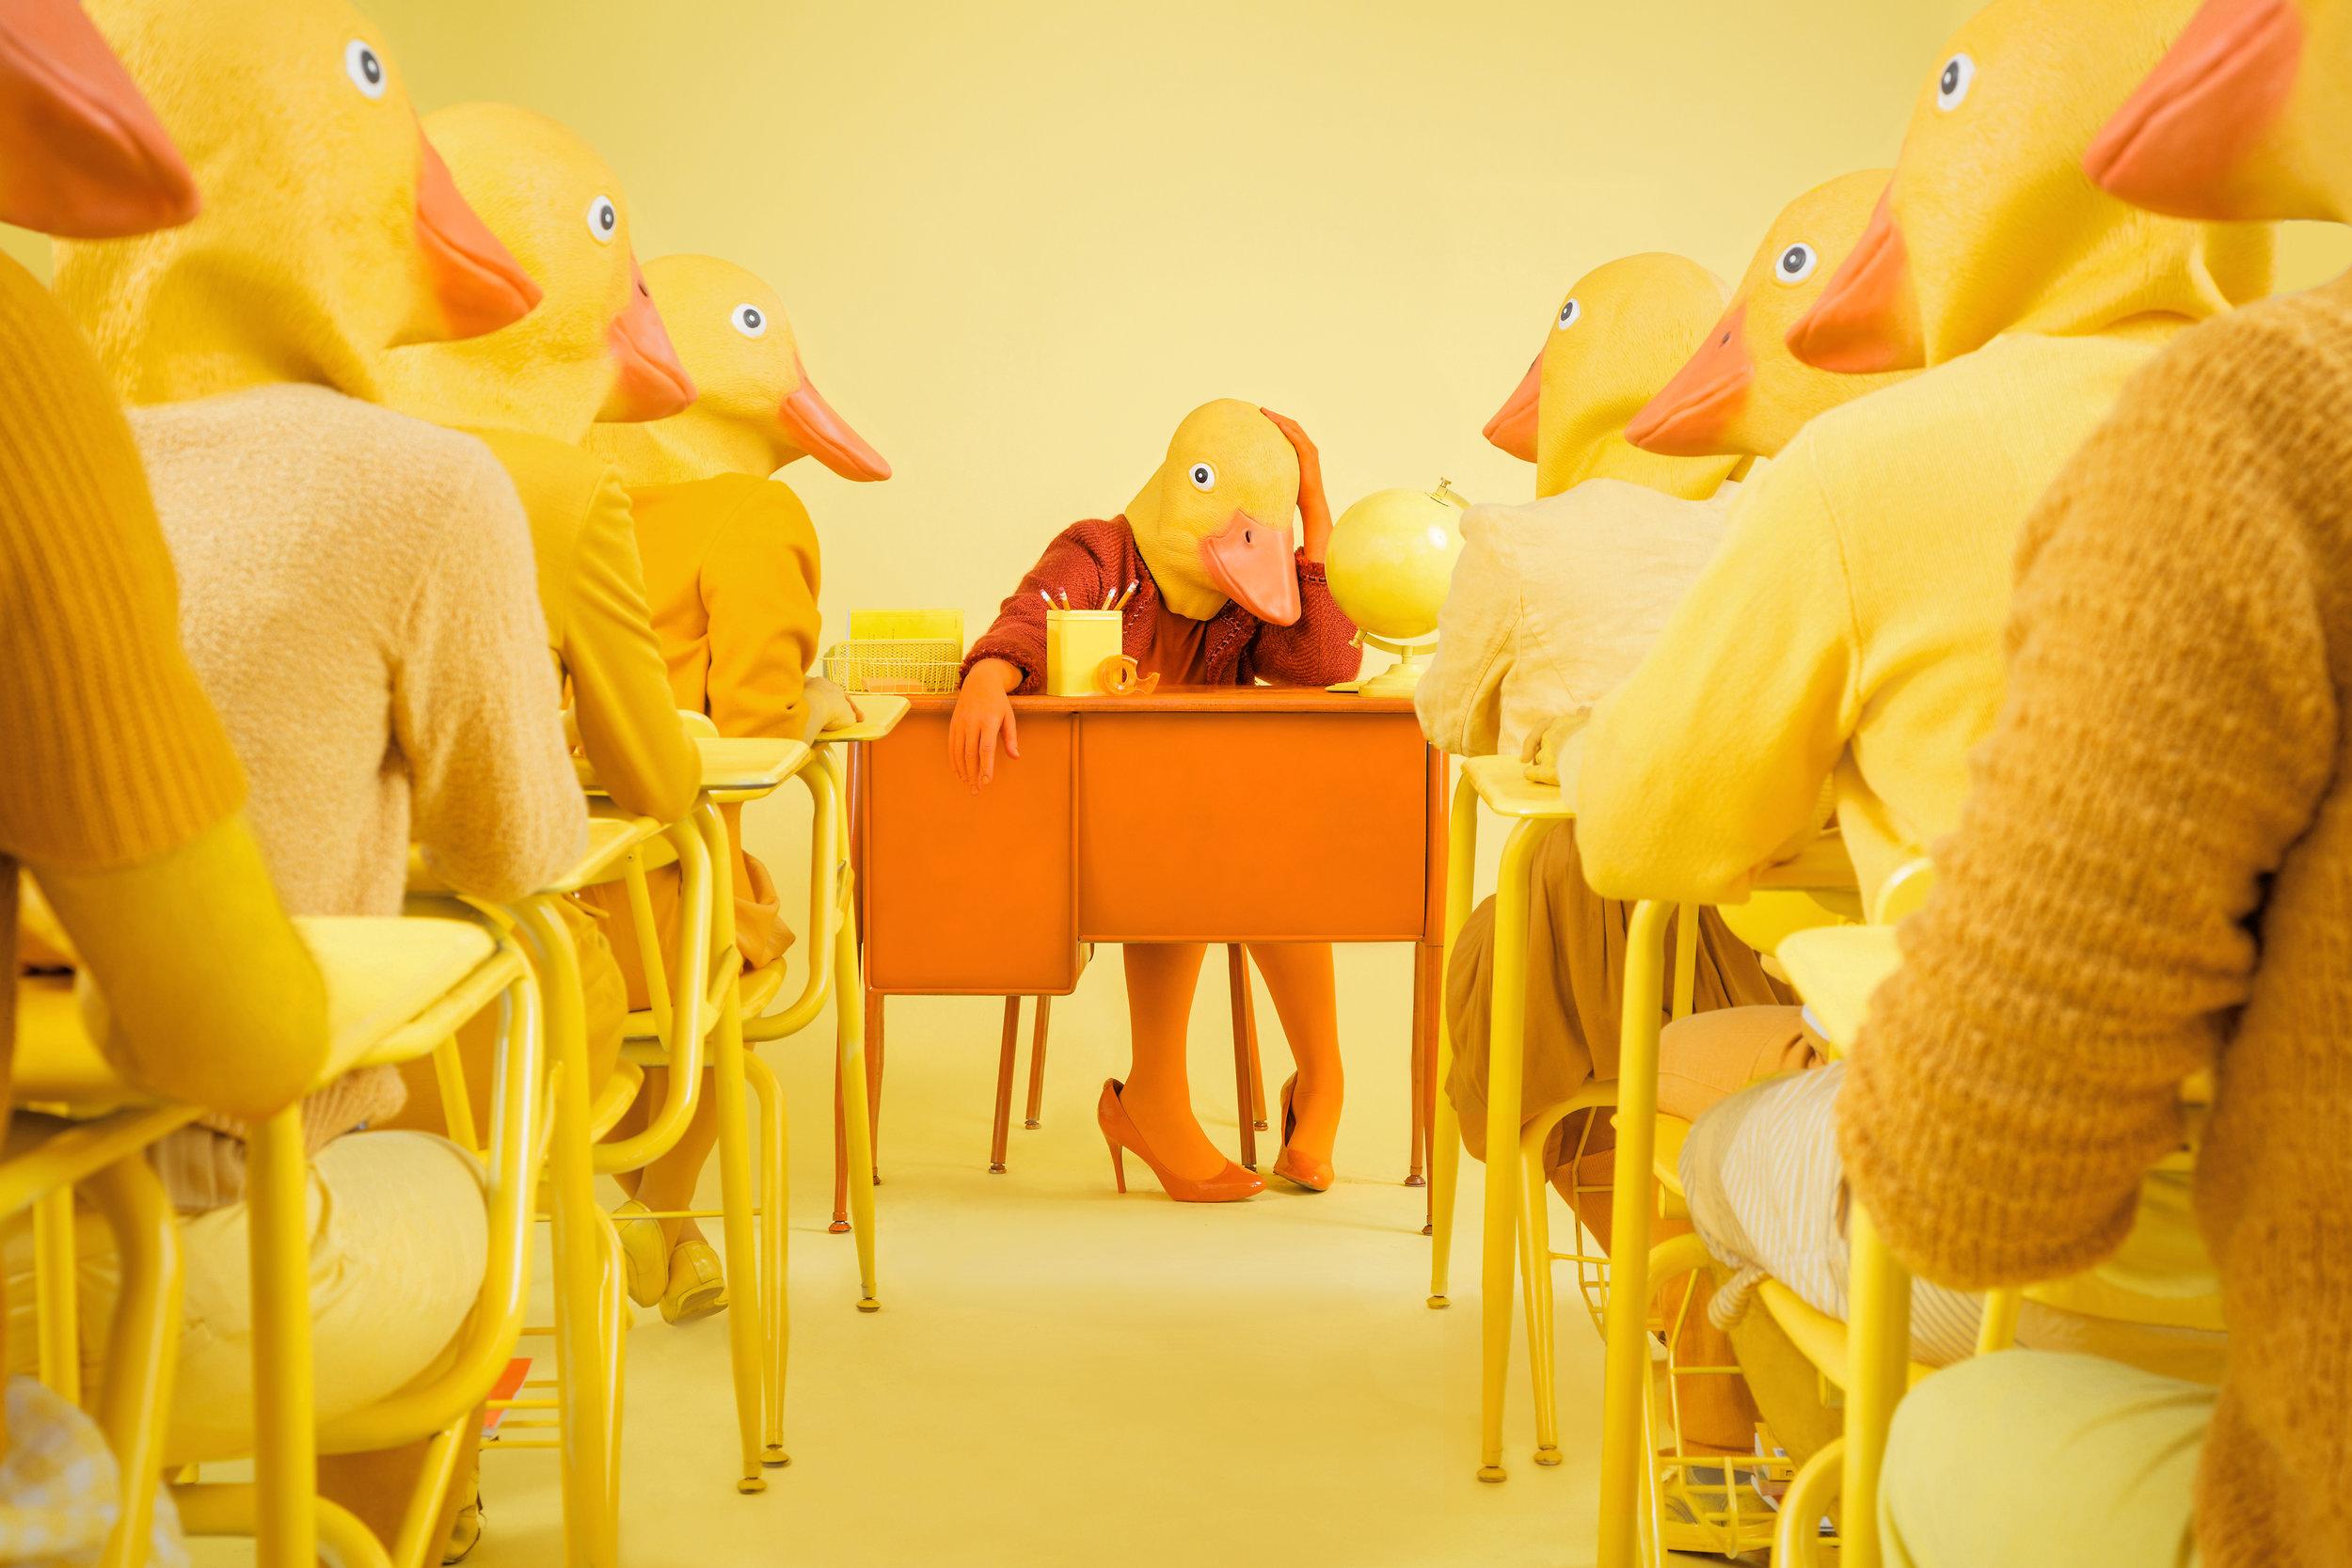 Iris-Ray-Melissa-Cripe-Party-Animals-Ducks-01.jpg